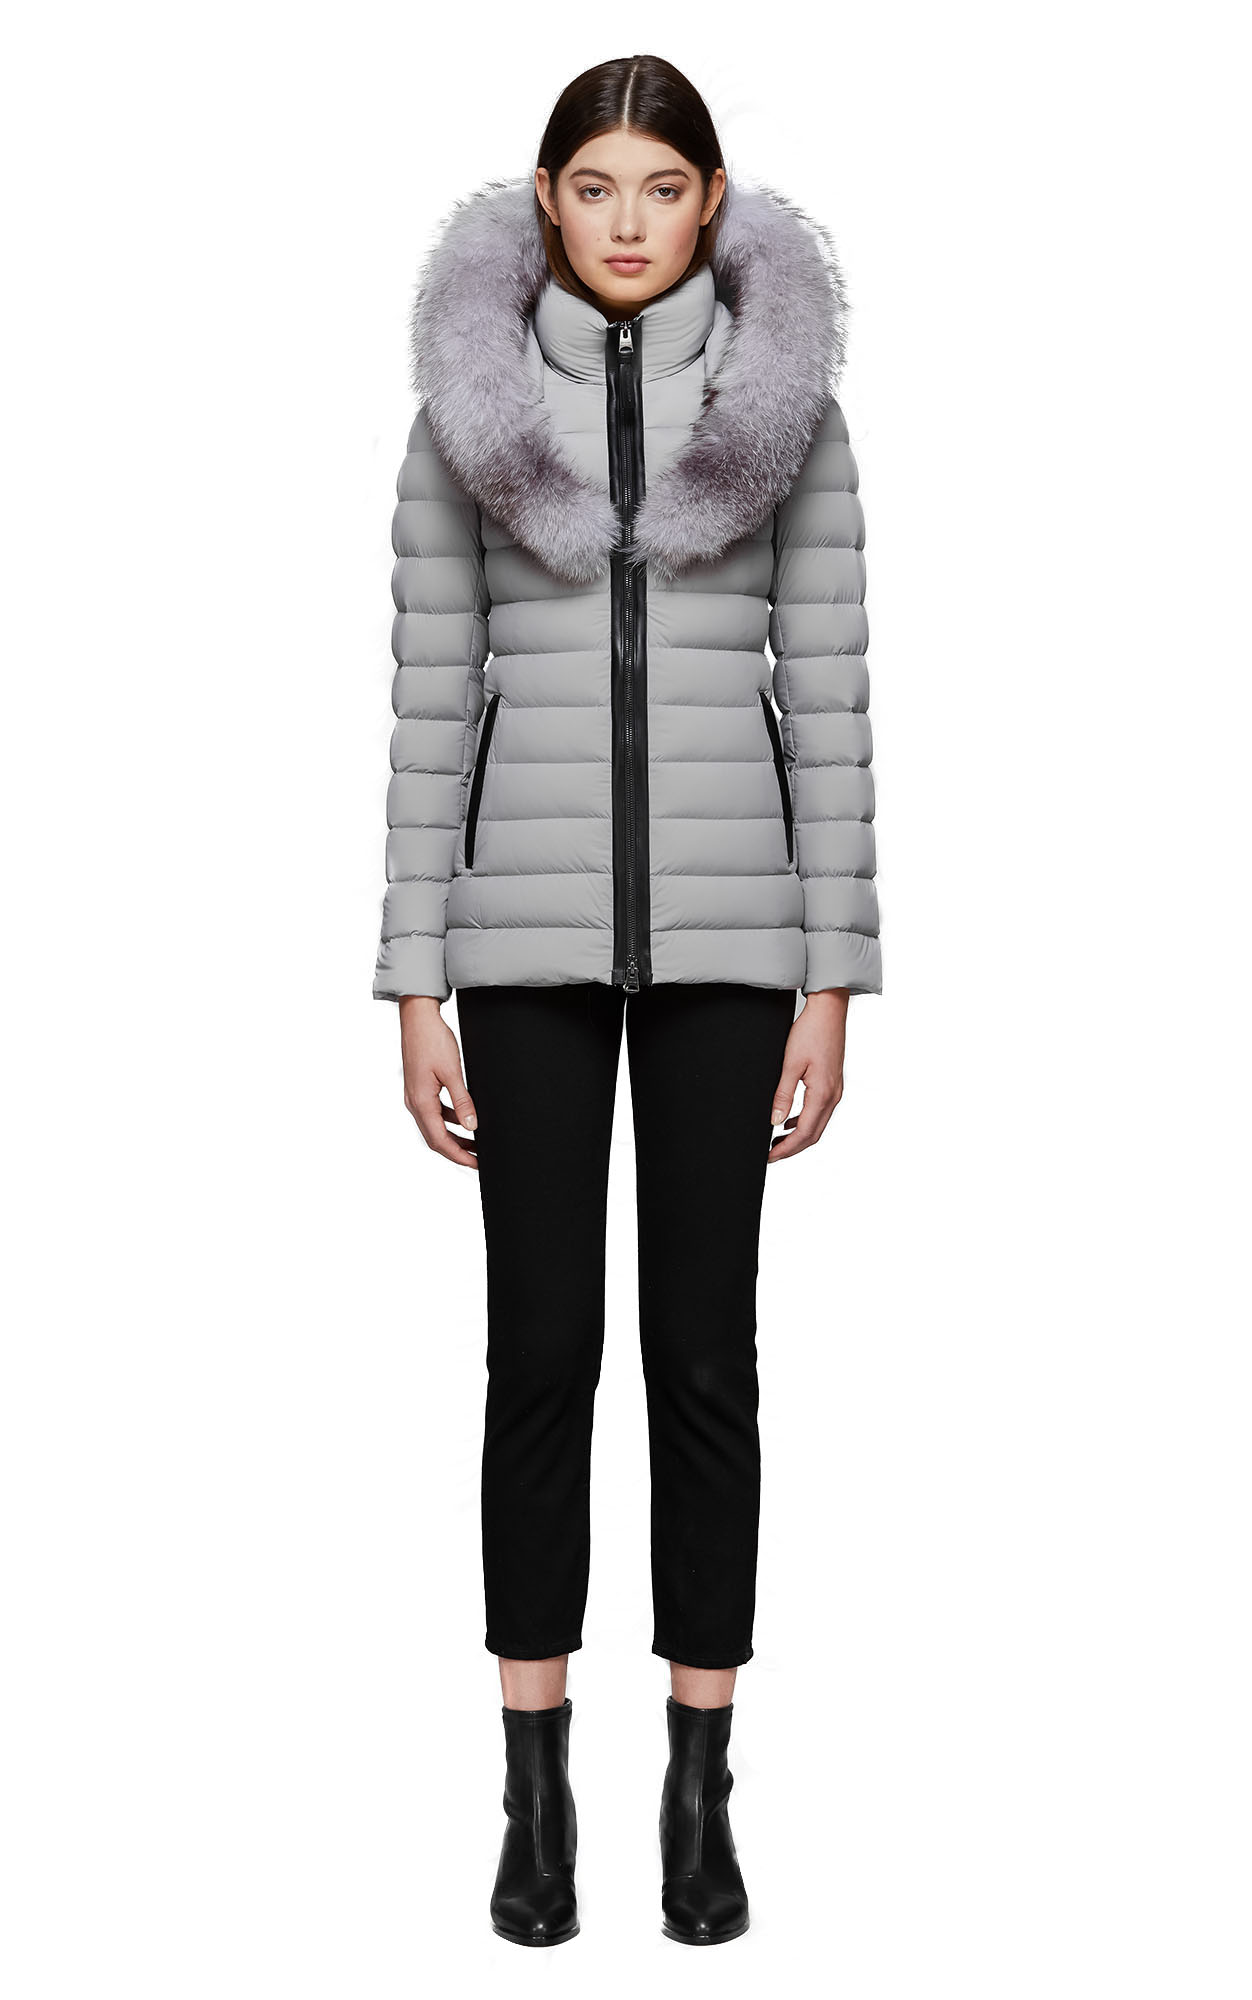 b43ec26c2 Mackage Kadalina-X Light Down Jacket With Fur Trimmed Collar - Womens